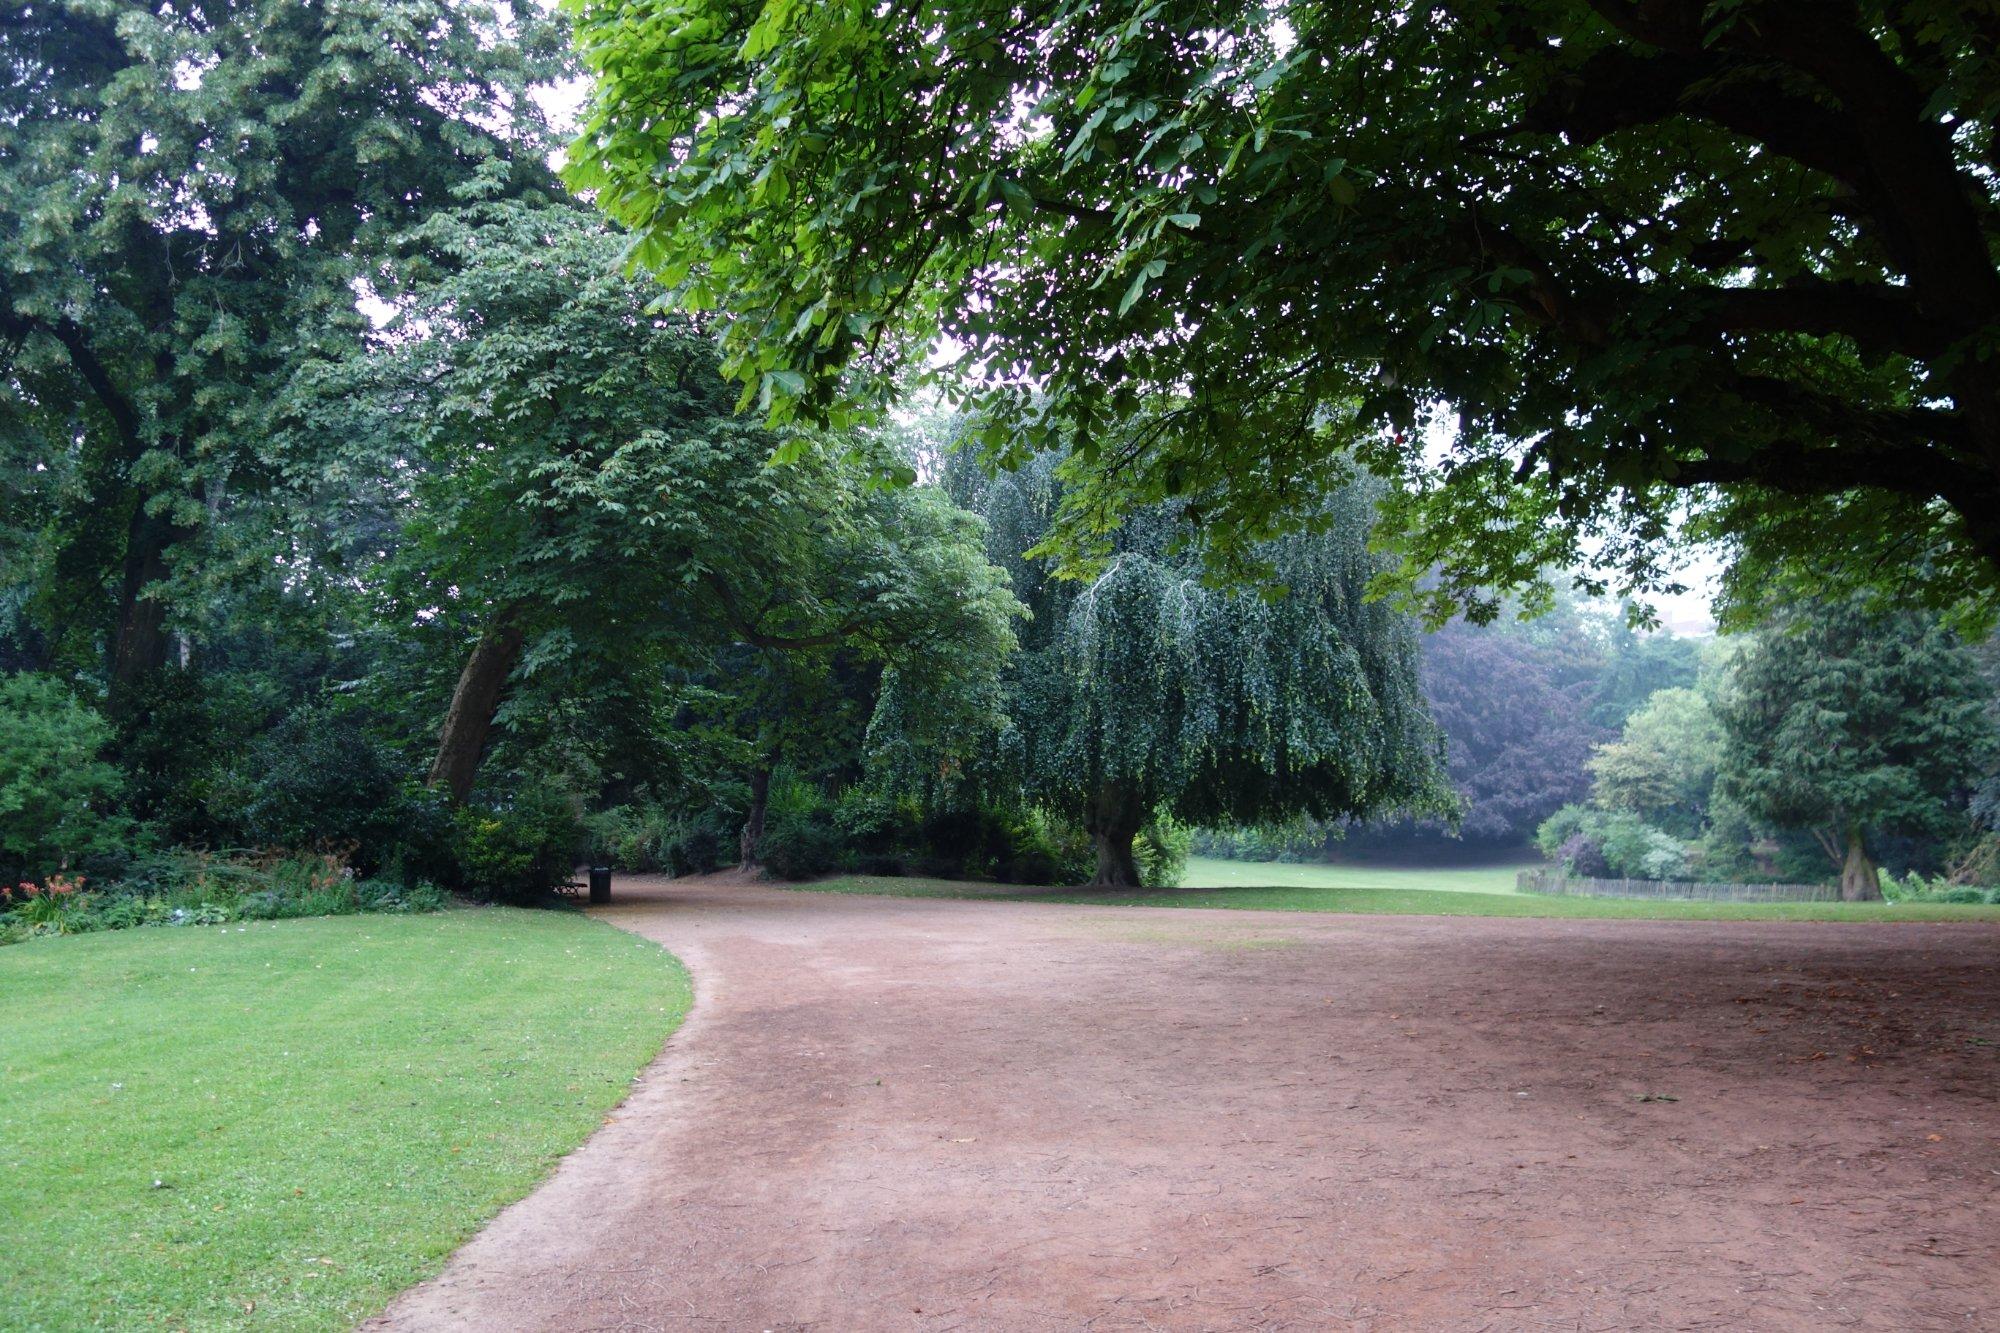 Jardin vauban vauban garden lille ce qu 39 il faut for Jardin vauban lille